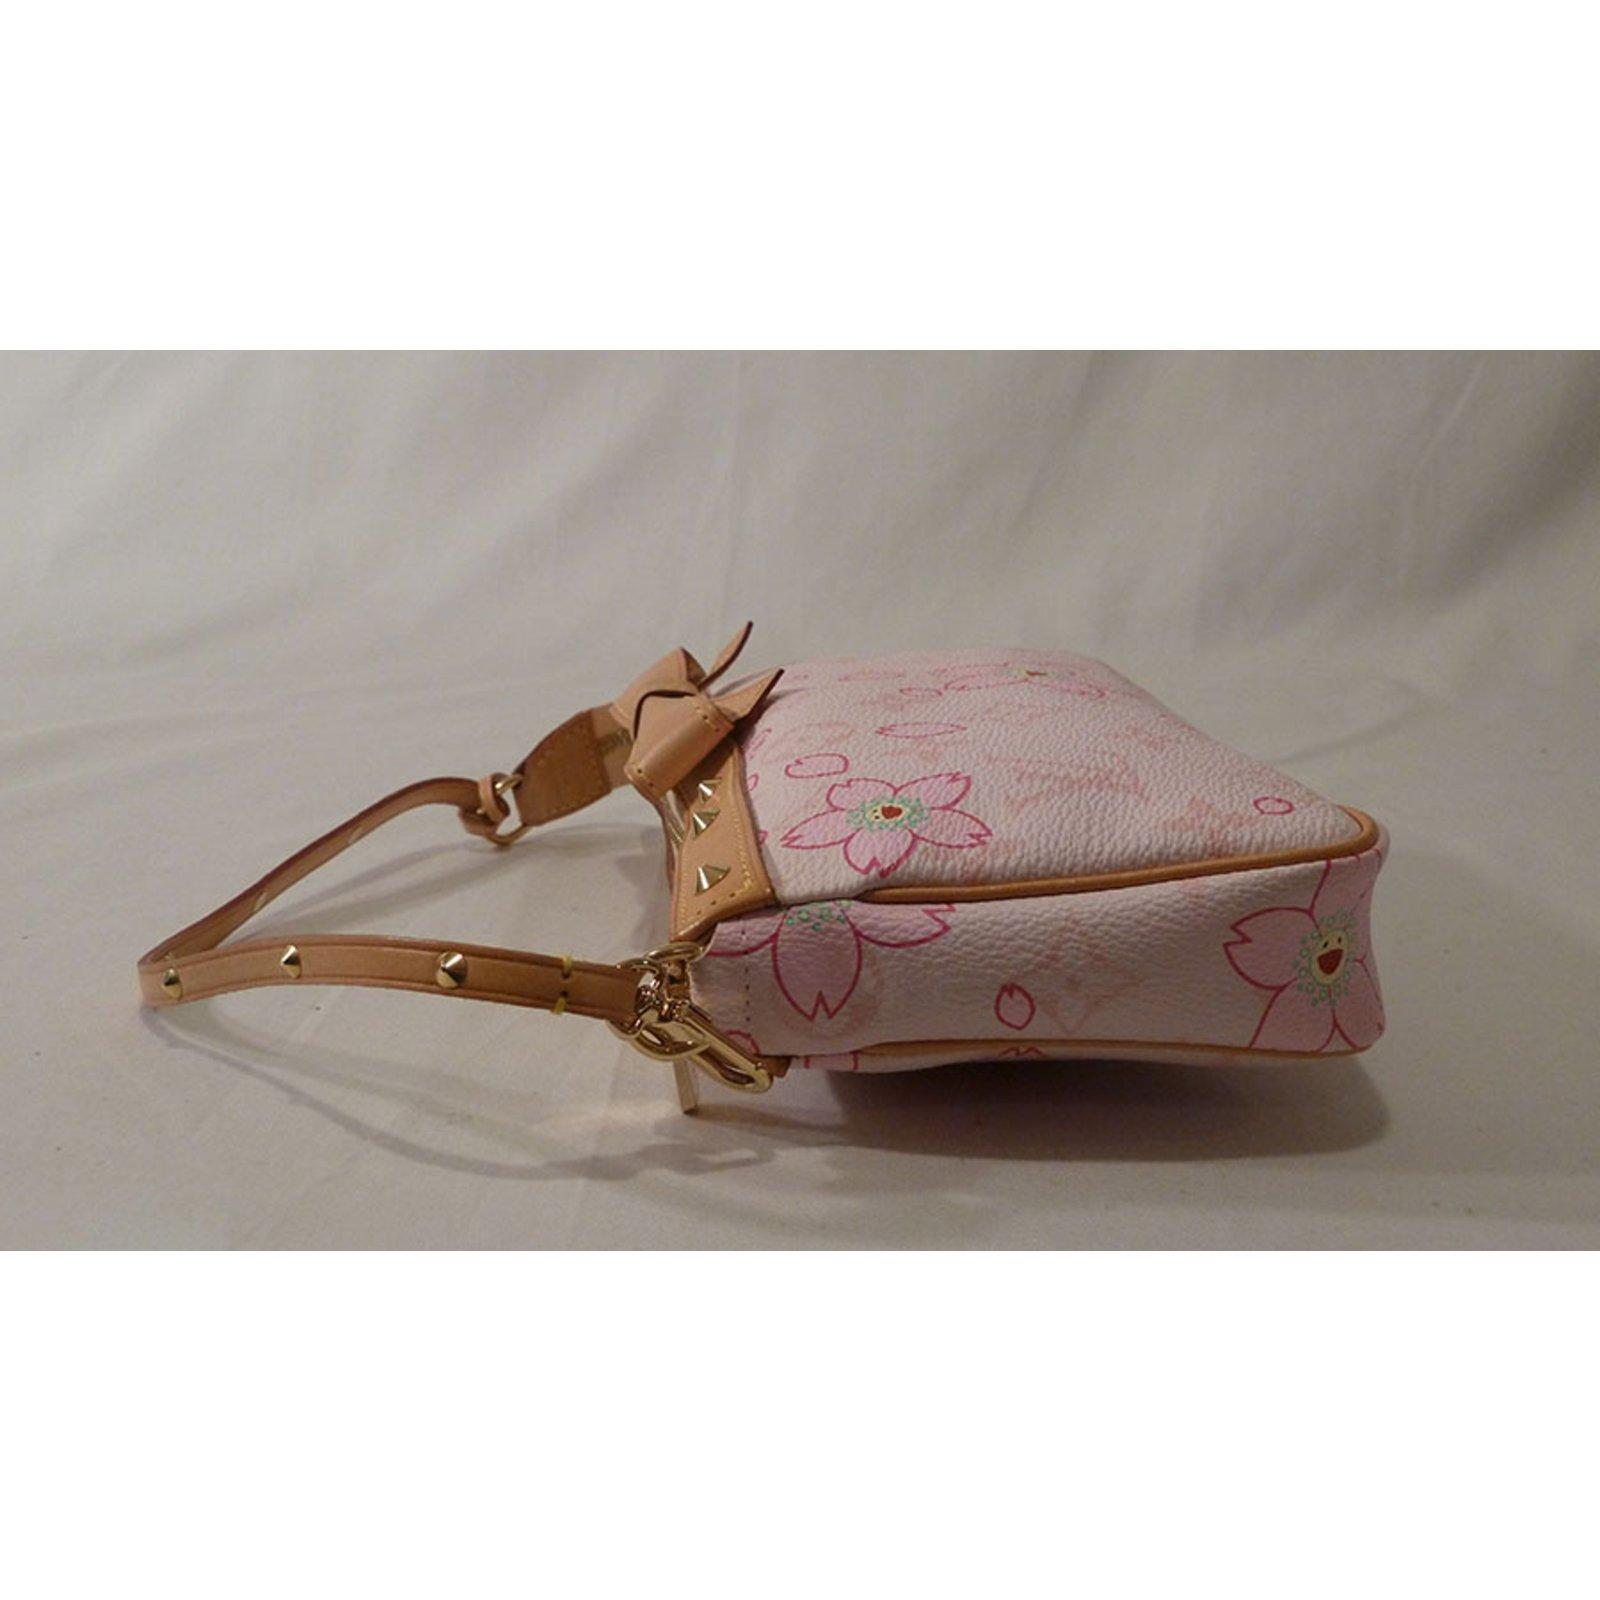 0d8ee1baa0 Louis Vuitton Takashi Murakami Cherry Blossom Monogram Stud Shoulder Bag  Handbags Other Pink ref.37553 - Joli Closet